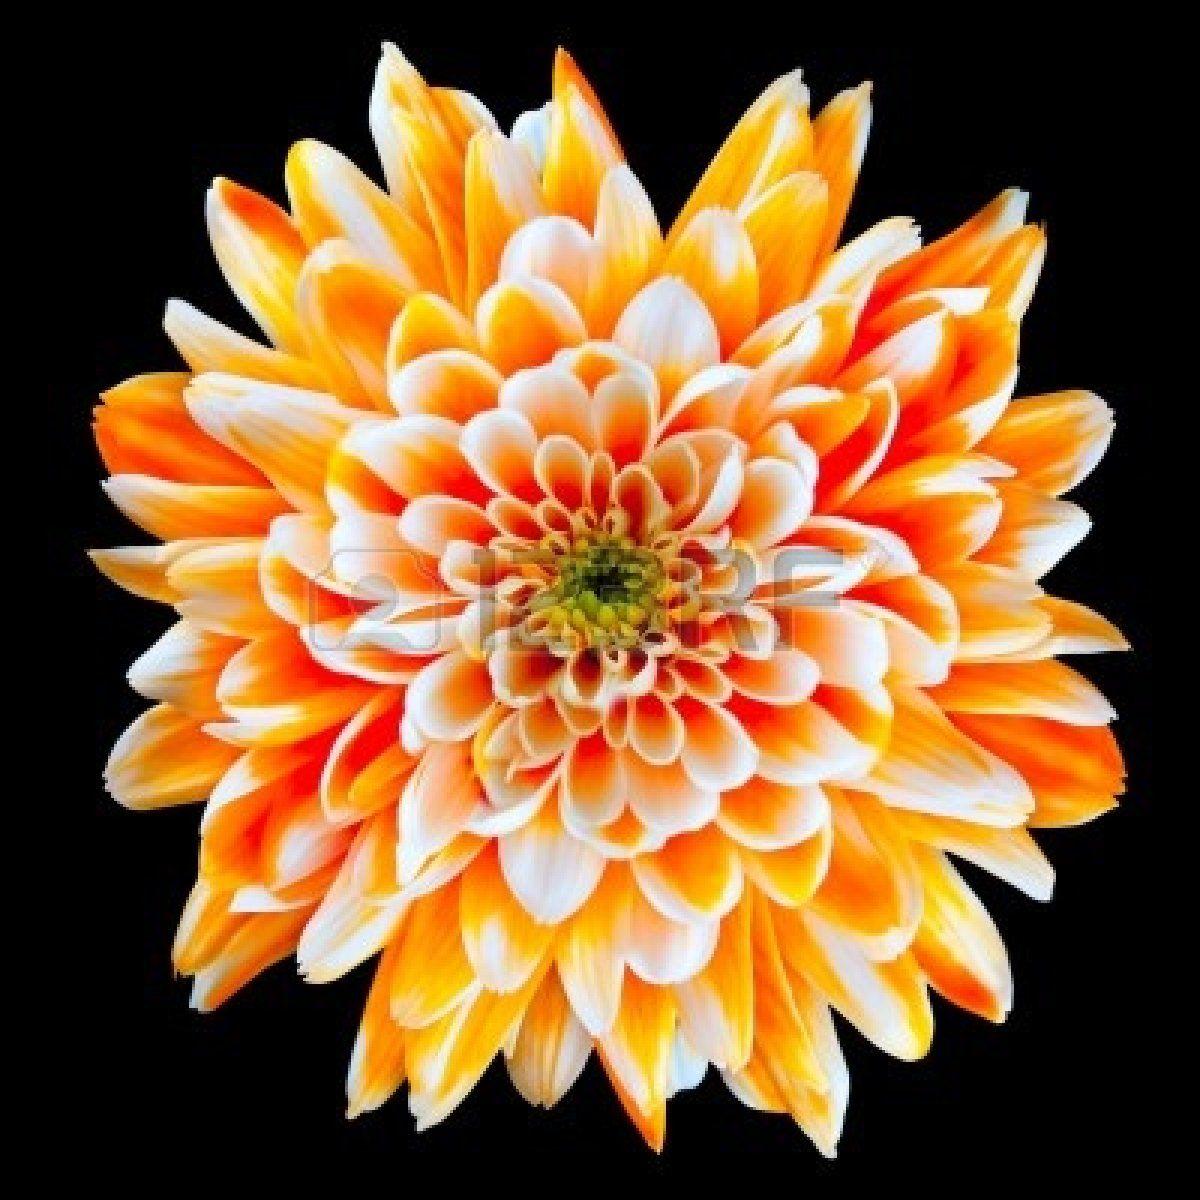 Single Orange And White Chrysanthemum Flower Isolated On Black